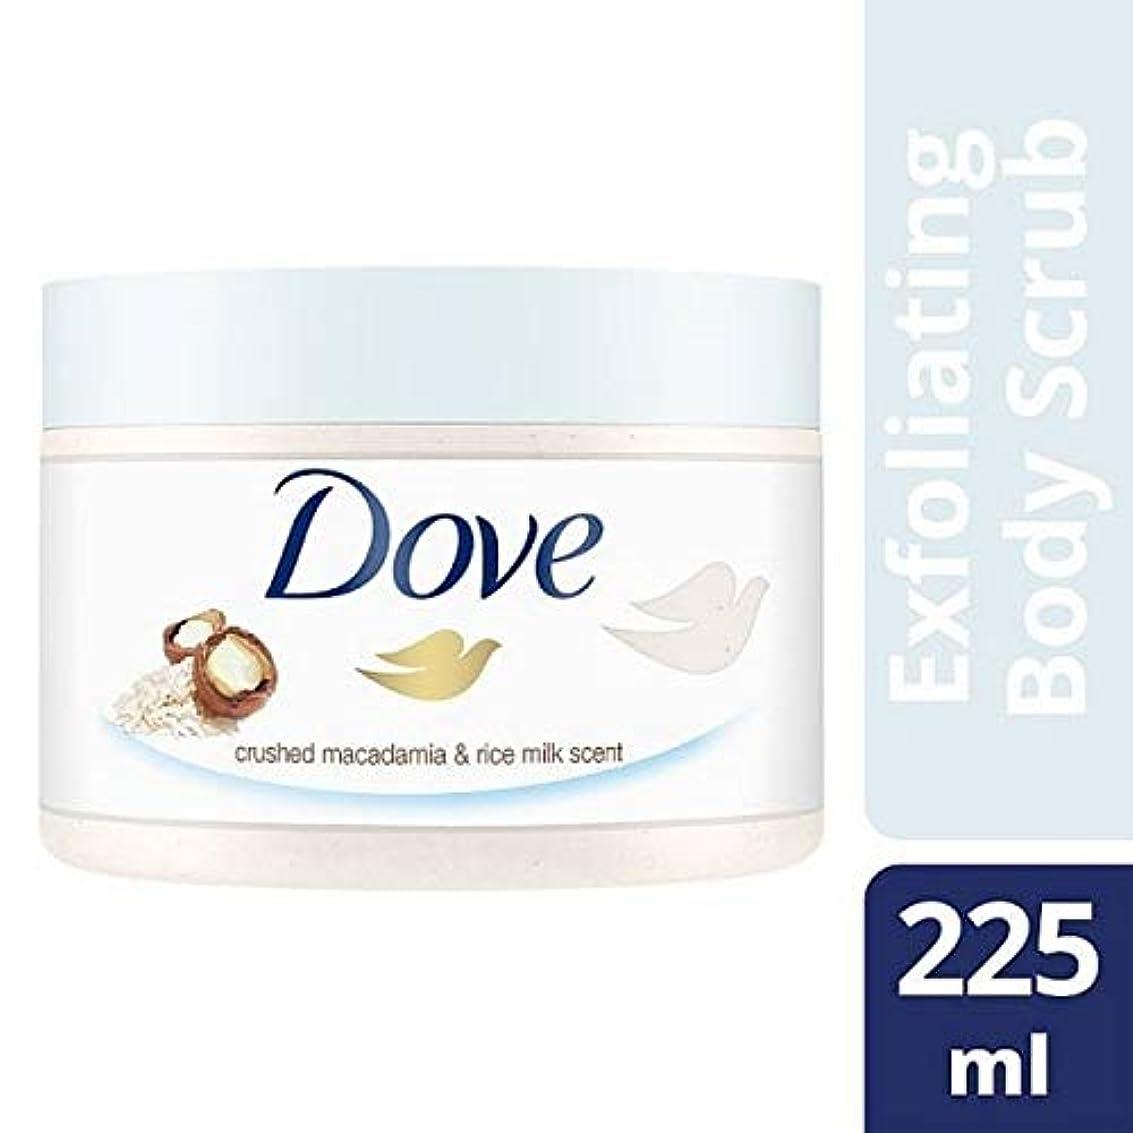 [Dove ] ボディスクラブマカダミア&ライスミルク225ミリリットルを剥離鳩 - Dove Exfoliating Body Scrub Macadamia & Rice Milk 225ml [並行輸入品]